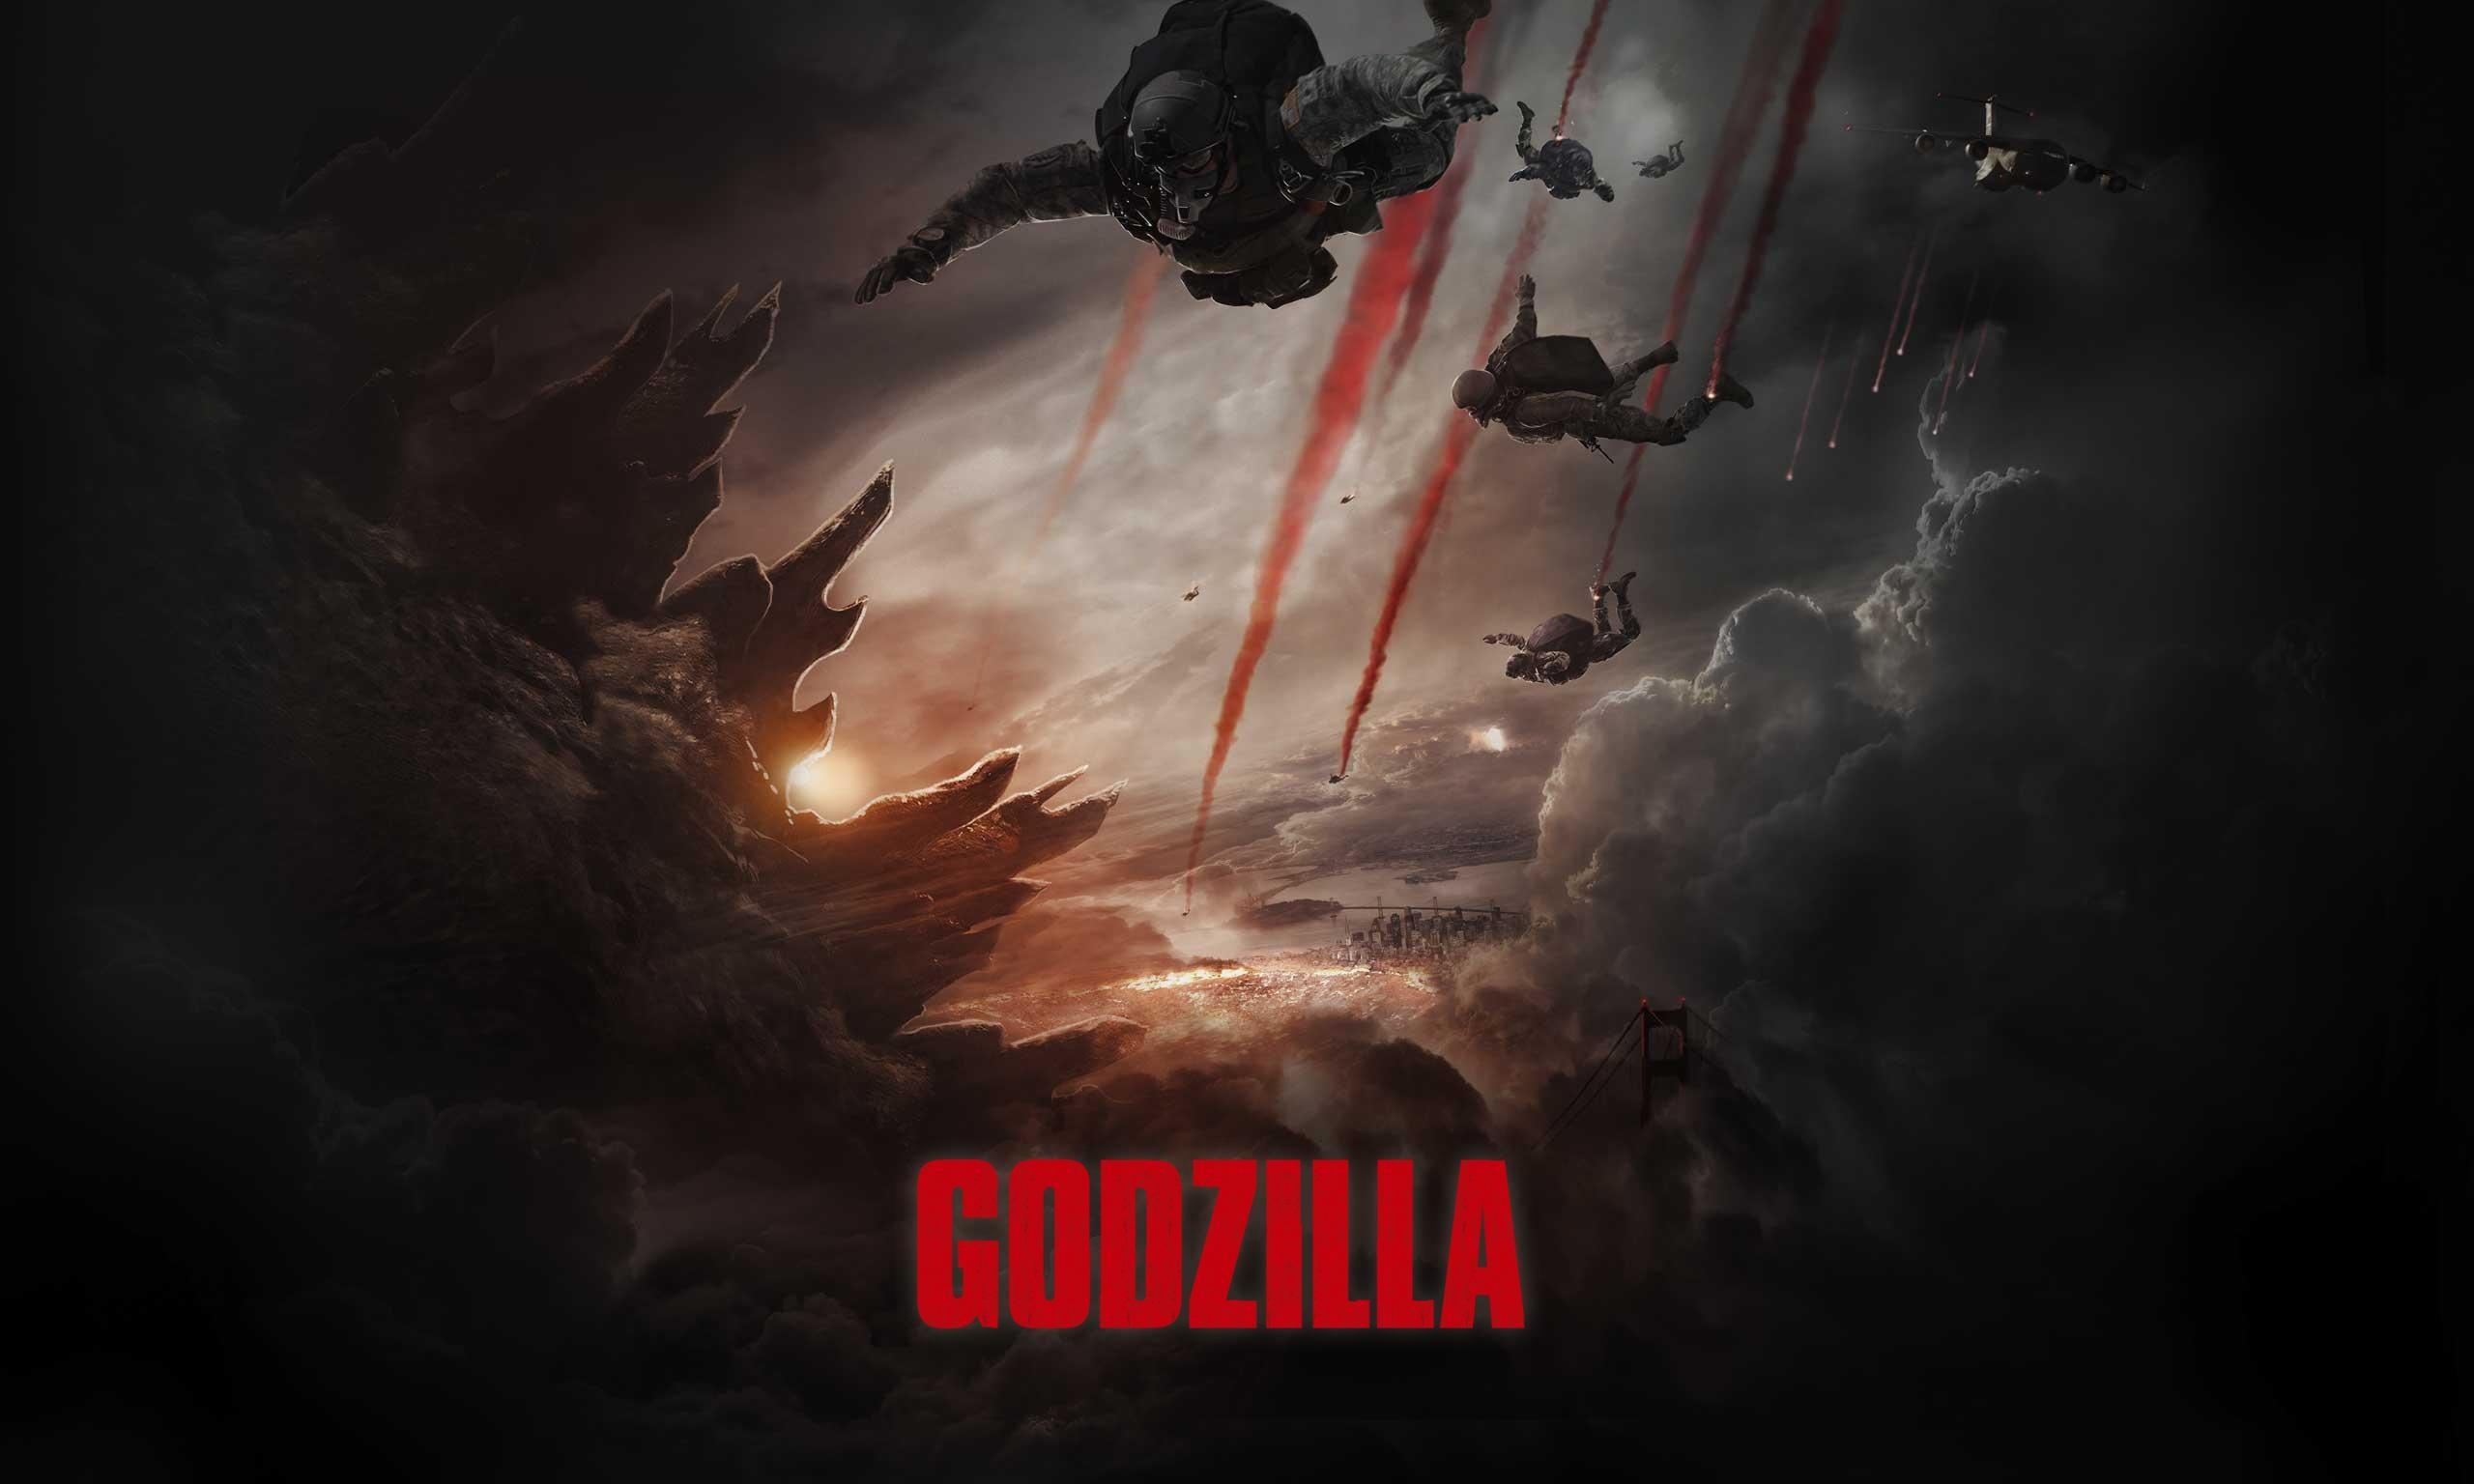 Godzilla 2014 Movie Wallpaper HD | Godzilla 2014 Movie